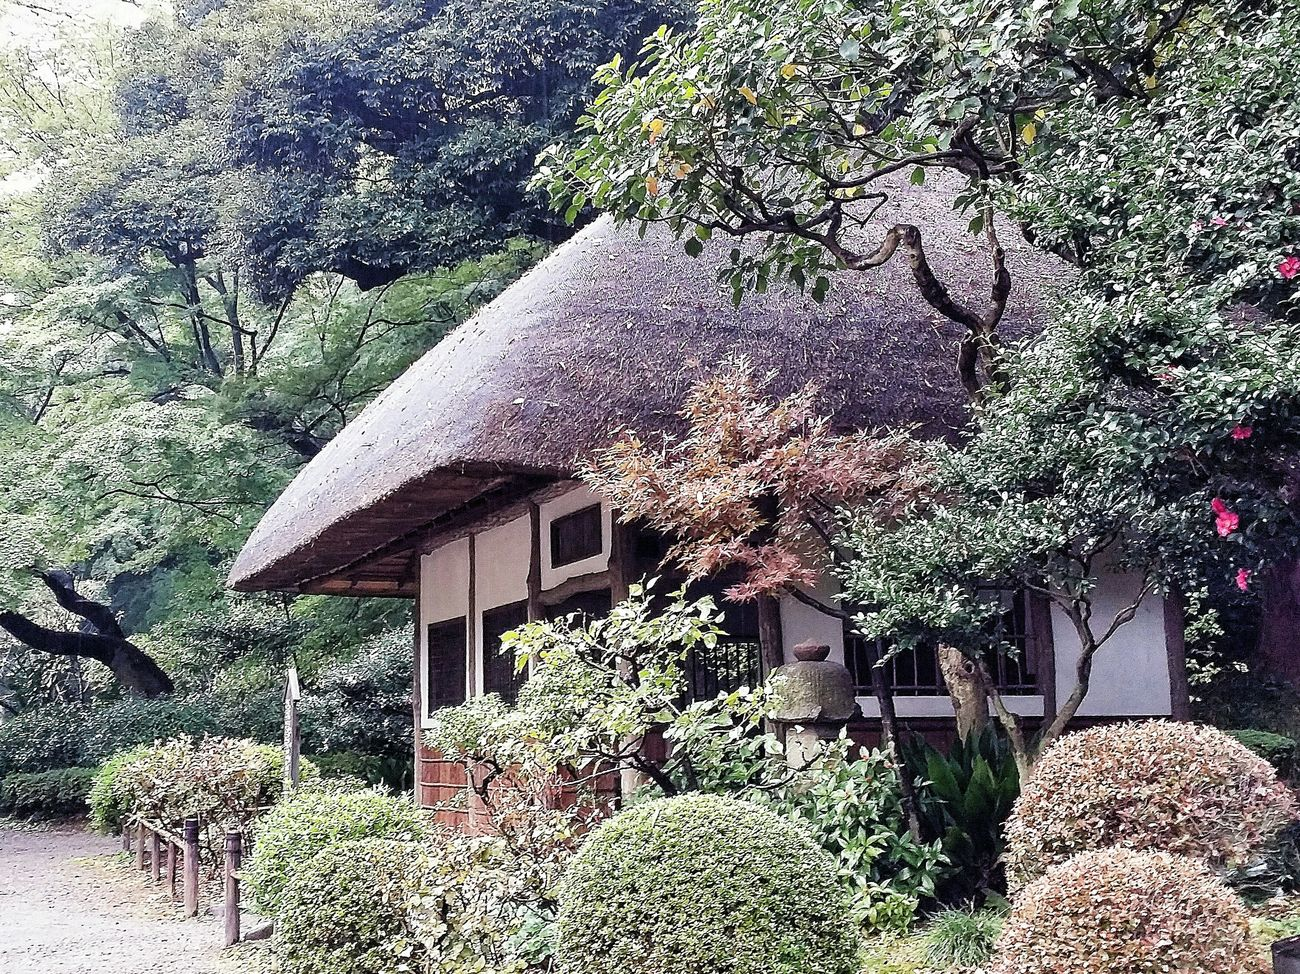 Rest Area Japanese  Building Design Architecture Architecture_collection Architecturelovers Koishikawa Korakuen 1629 Tokugawa Edo Period Clan Garden Tokyo Autumn 2015 Tokyo Japan Travelphotography